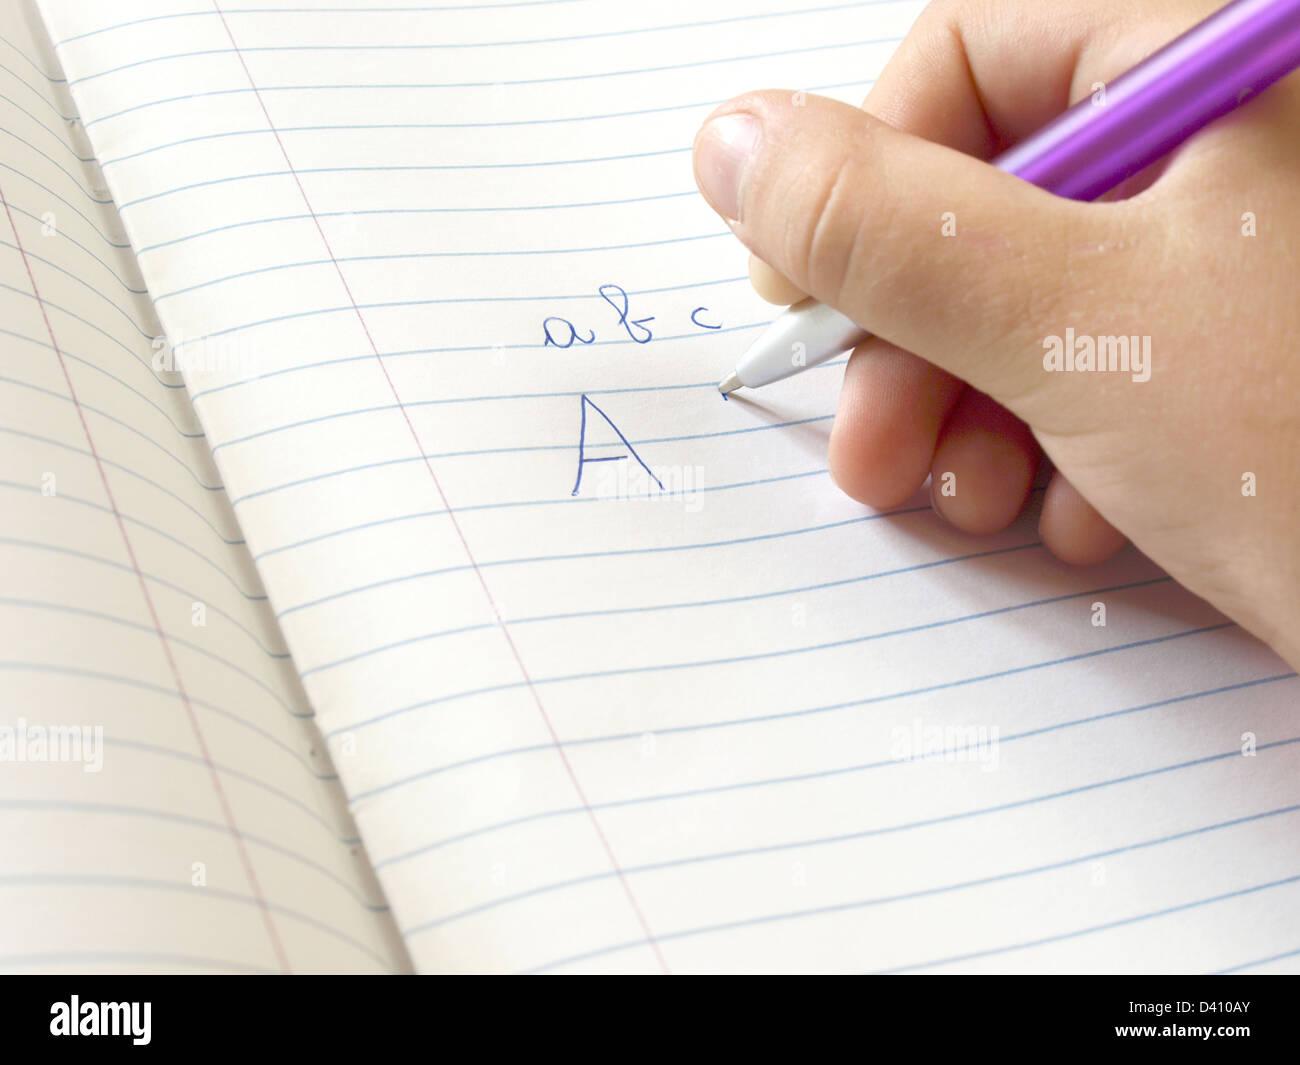 little hand writing homework on exercise book - Stock Image